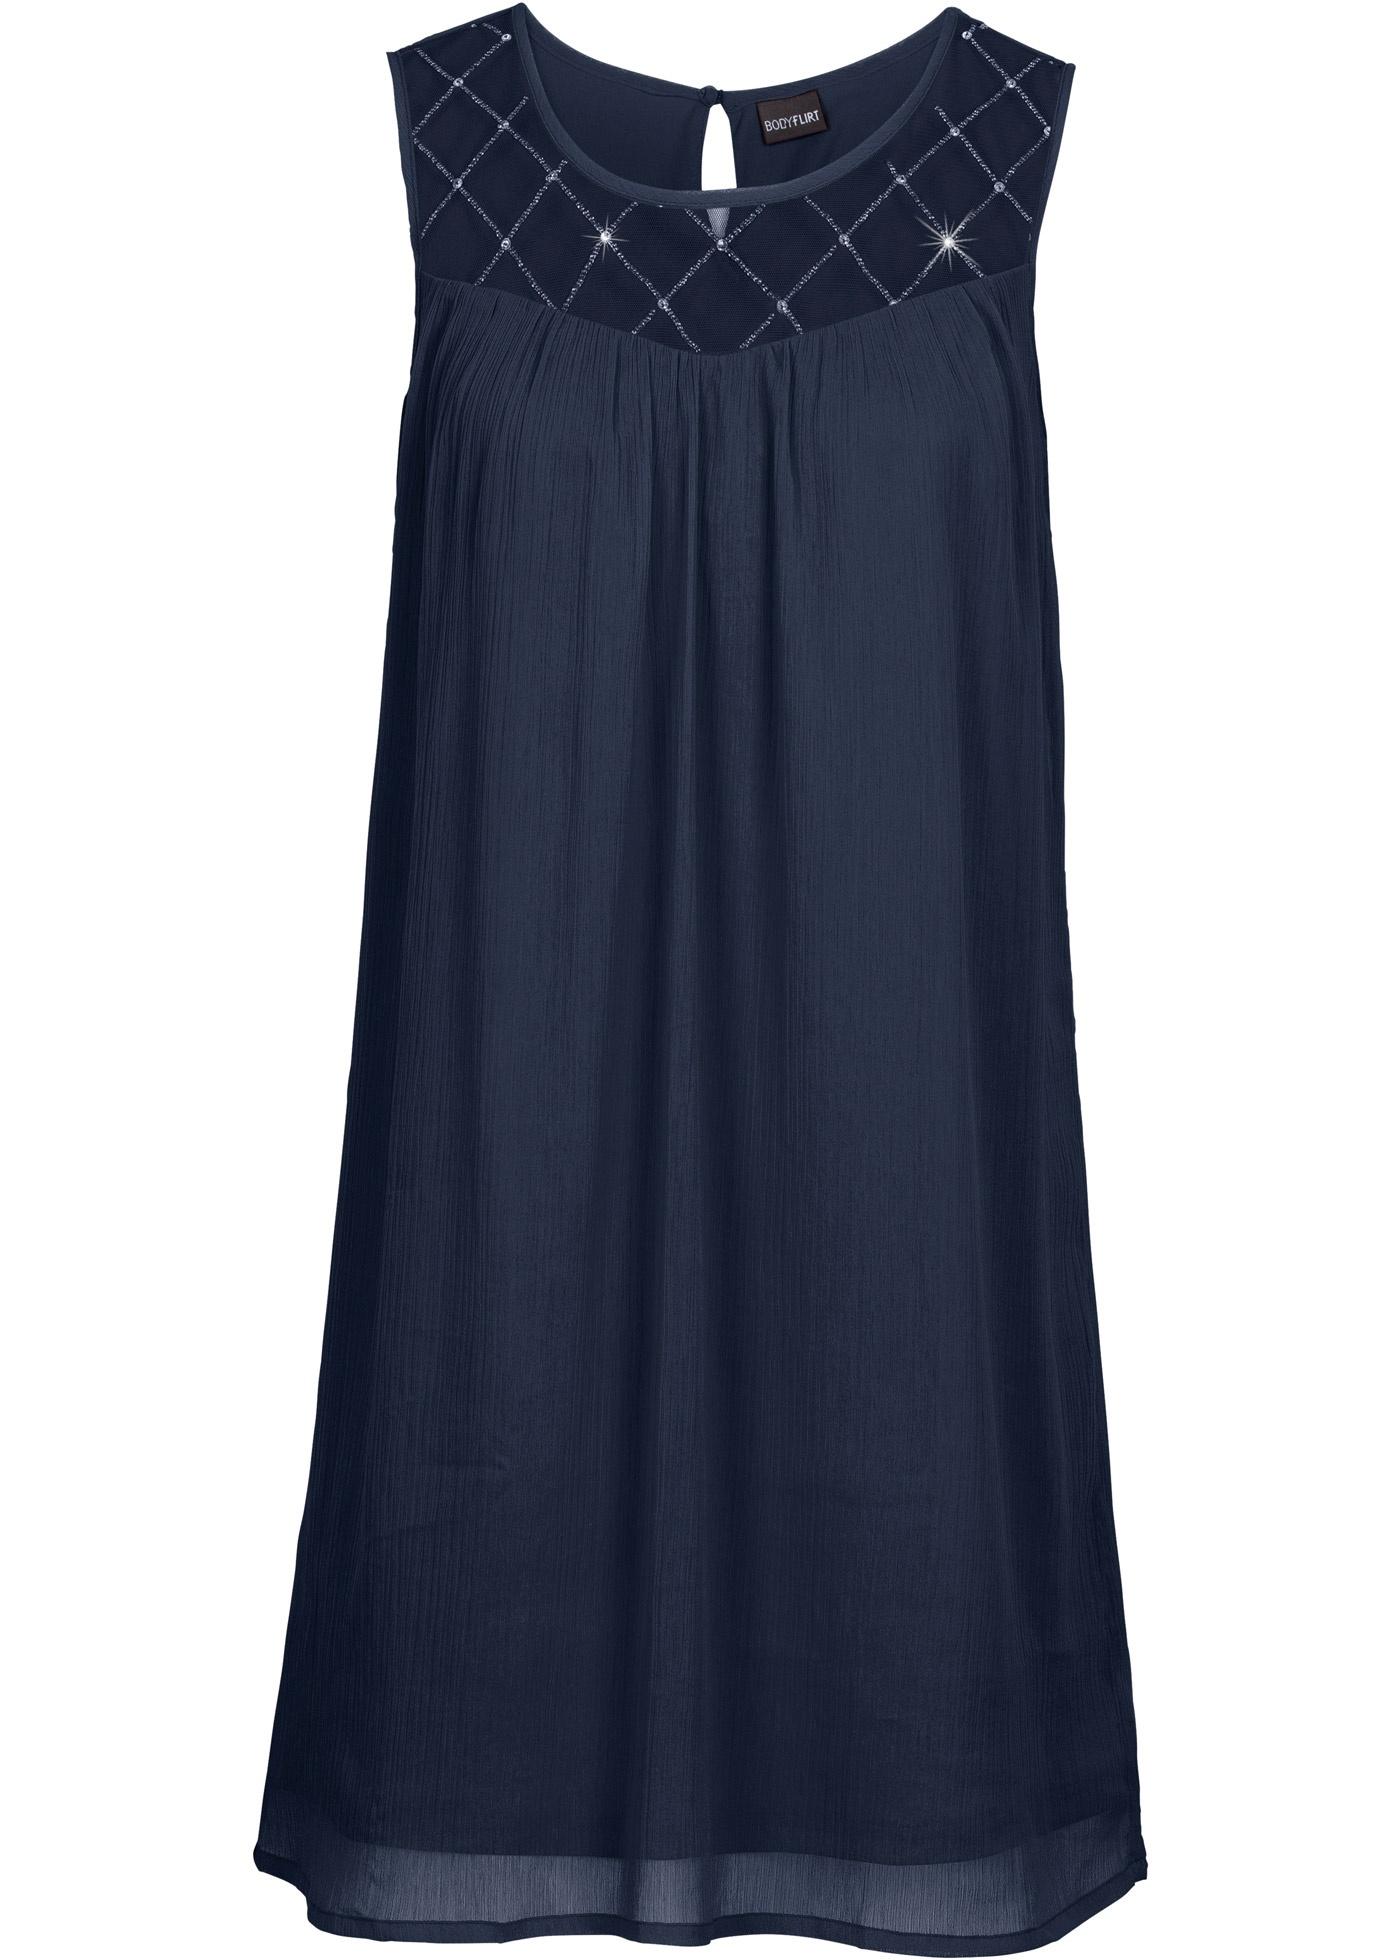 kleid mit perlen gr 48 dunkelblau cocktailkleid mini. Black Bedroom Furniture Sets. Home Design Ideas